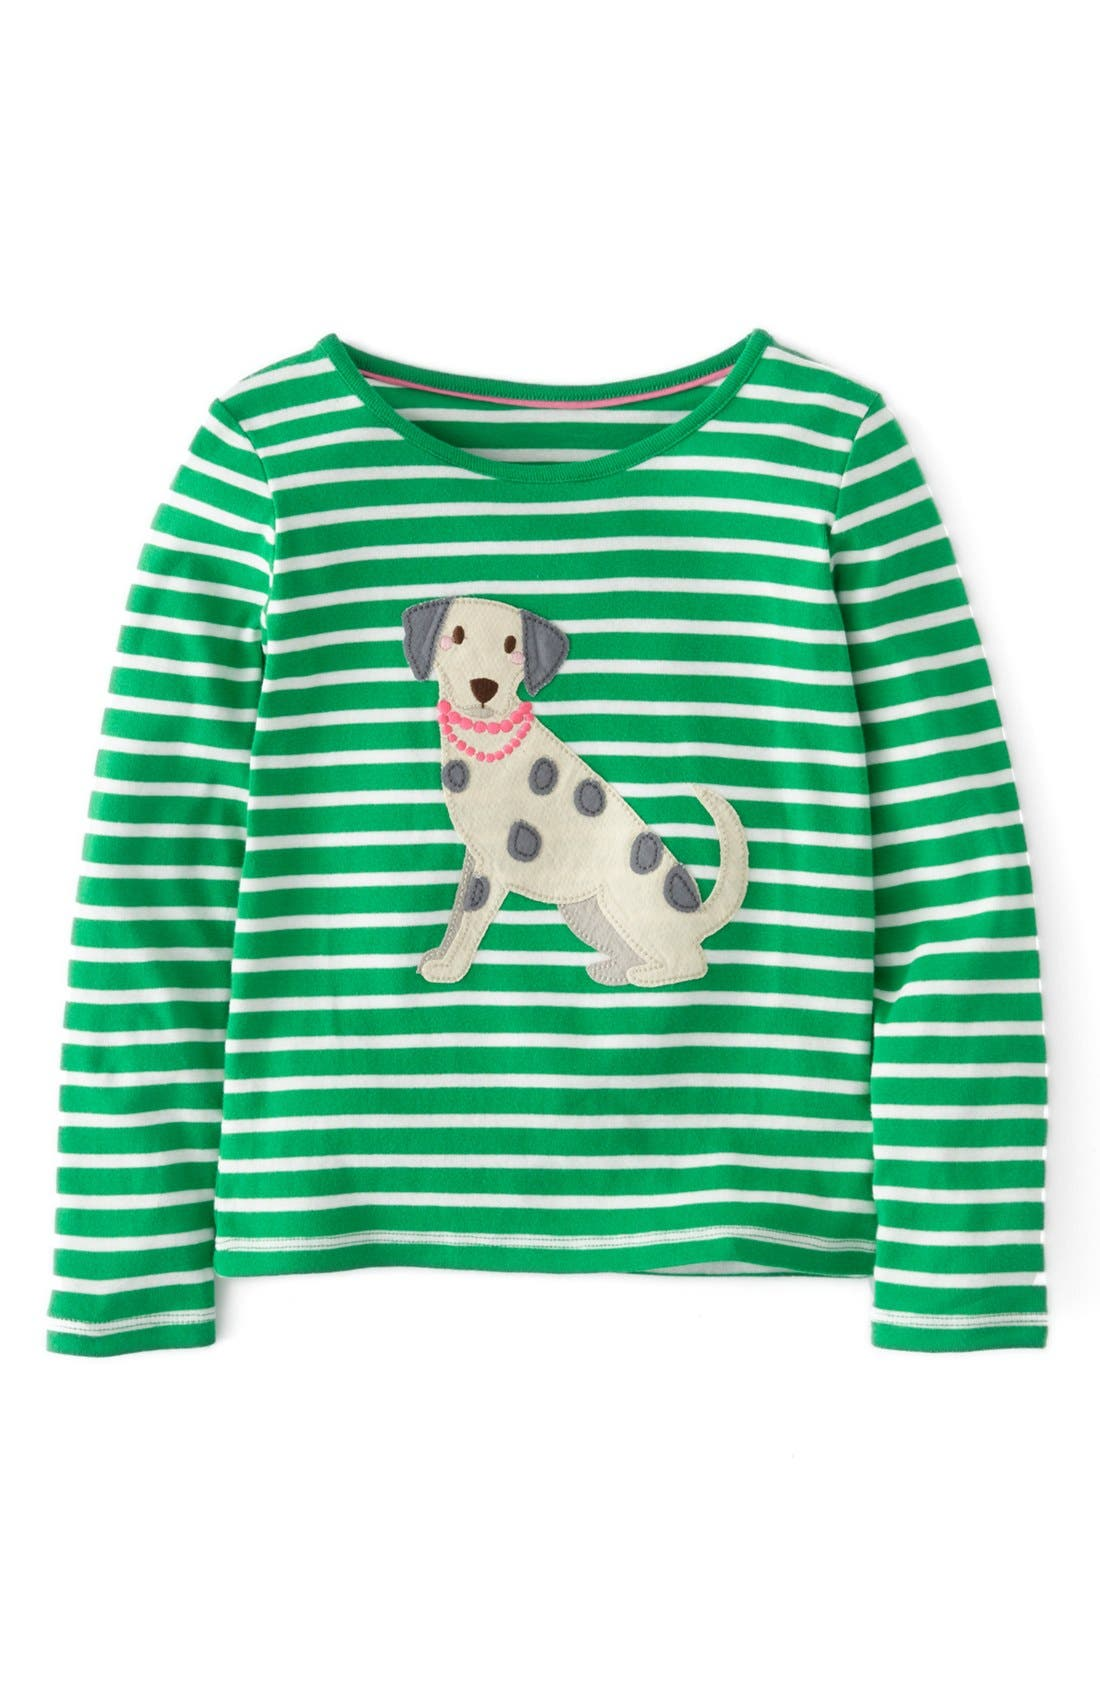 Main Image - Mini Boden 'Party Pet' Appliqué Tee (Little Girls & Big Girls)